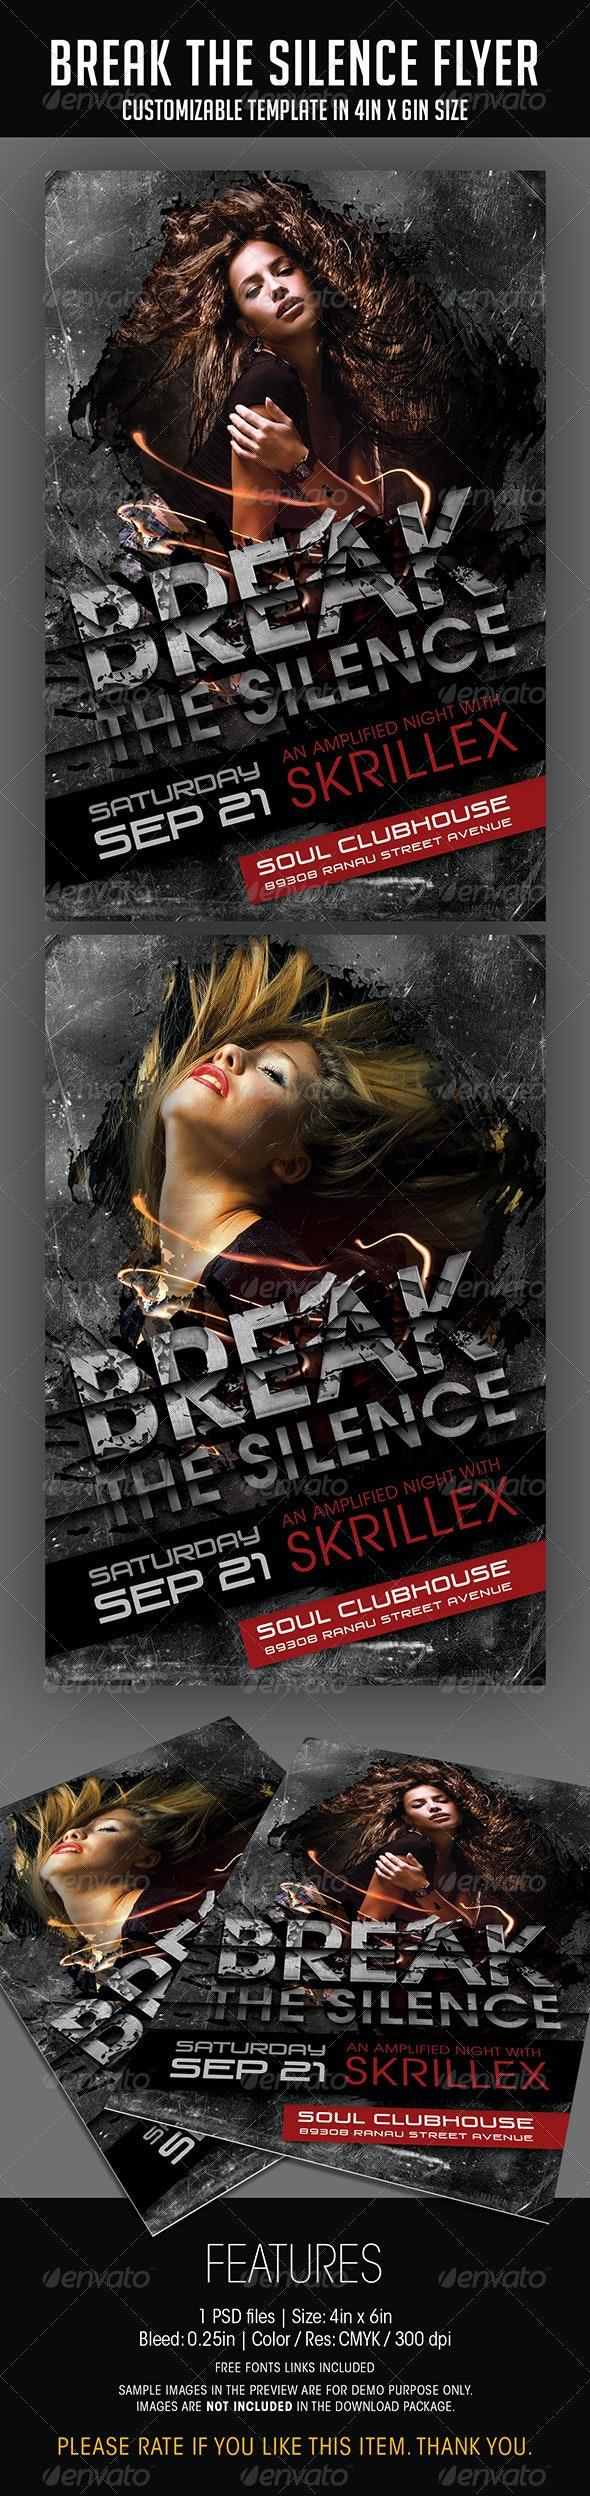 Break The Silence Party Flyer - Print Templates